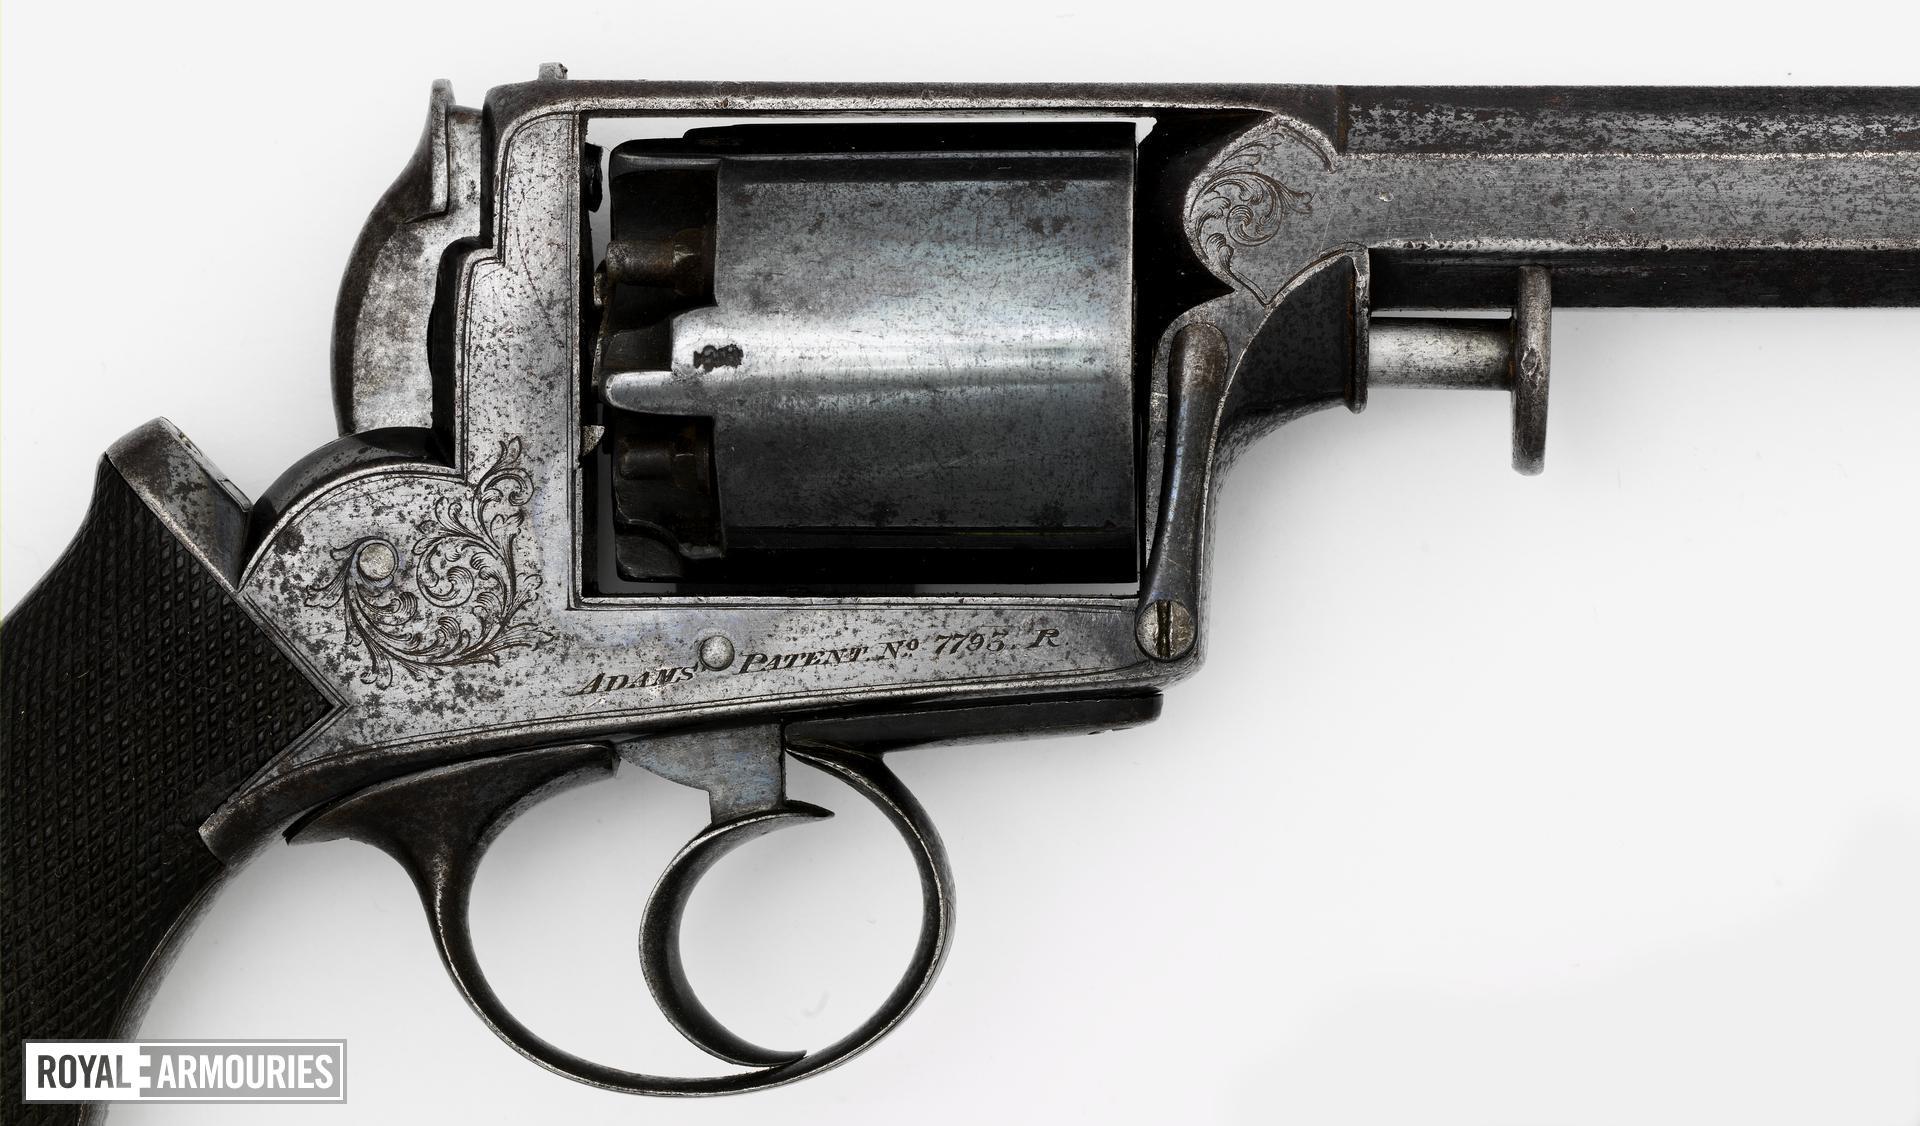 Percussion five-shot revolver - Adams Model 1851